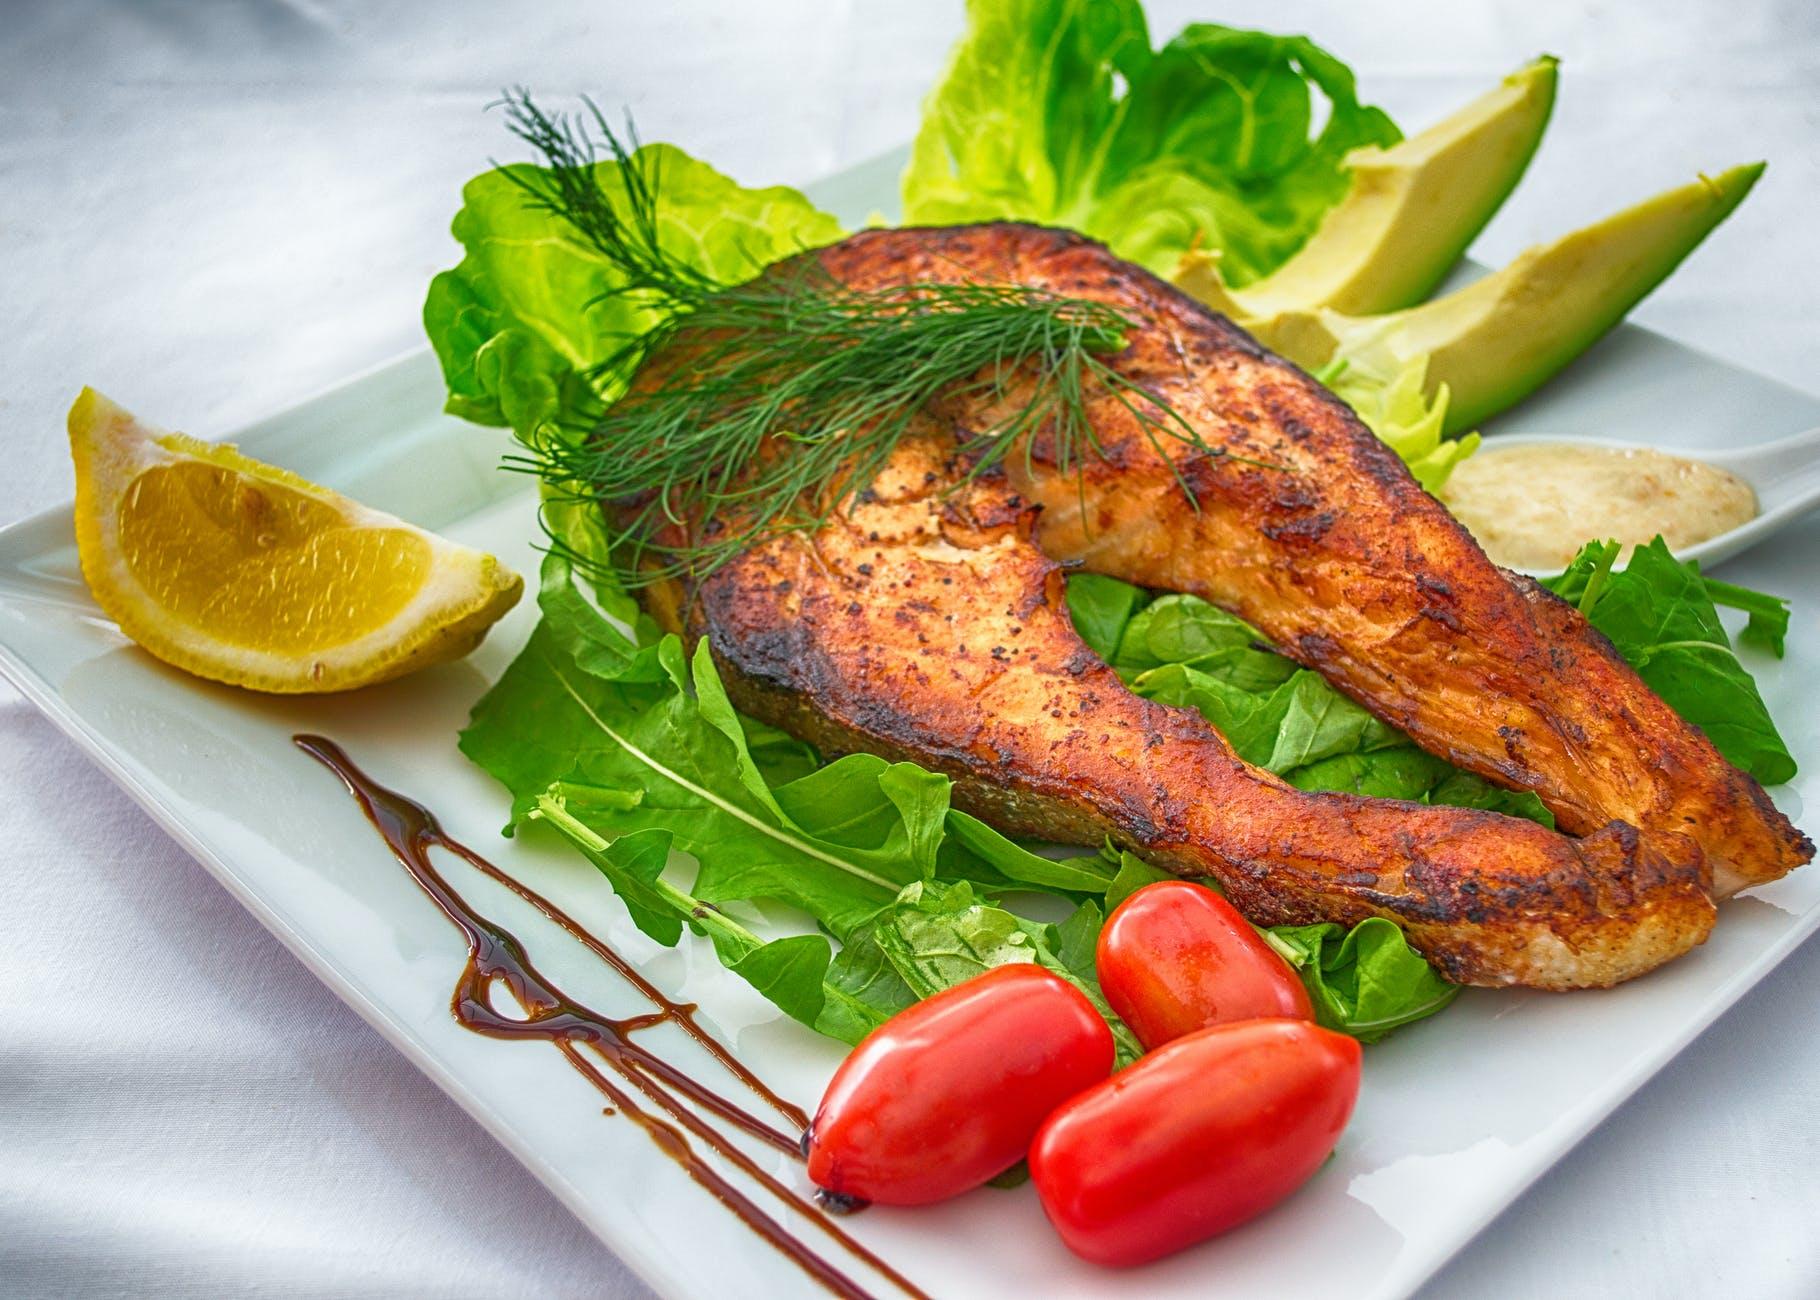 PLATE FOOD SALMON